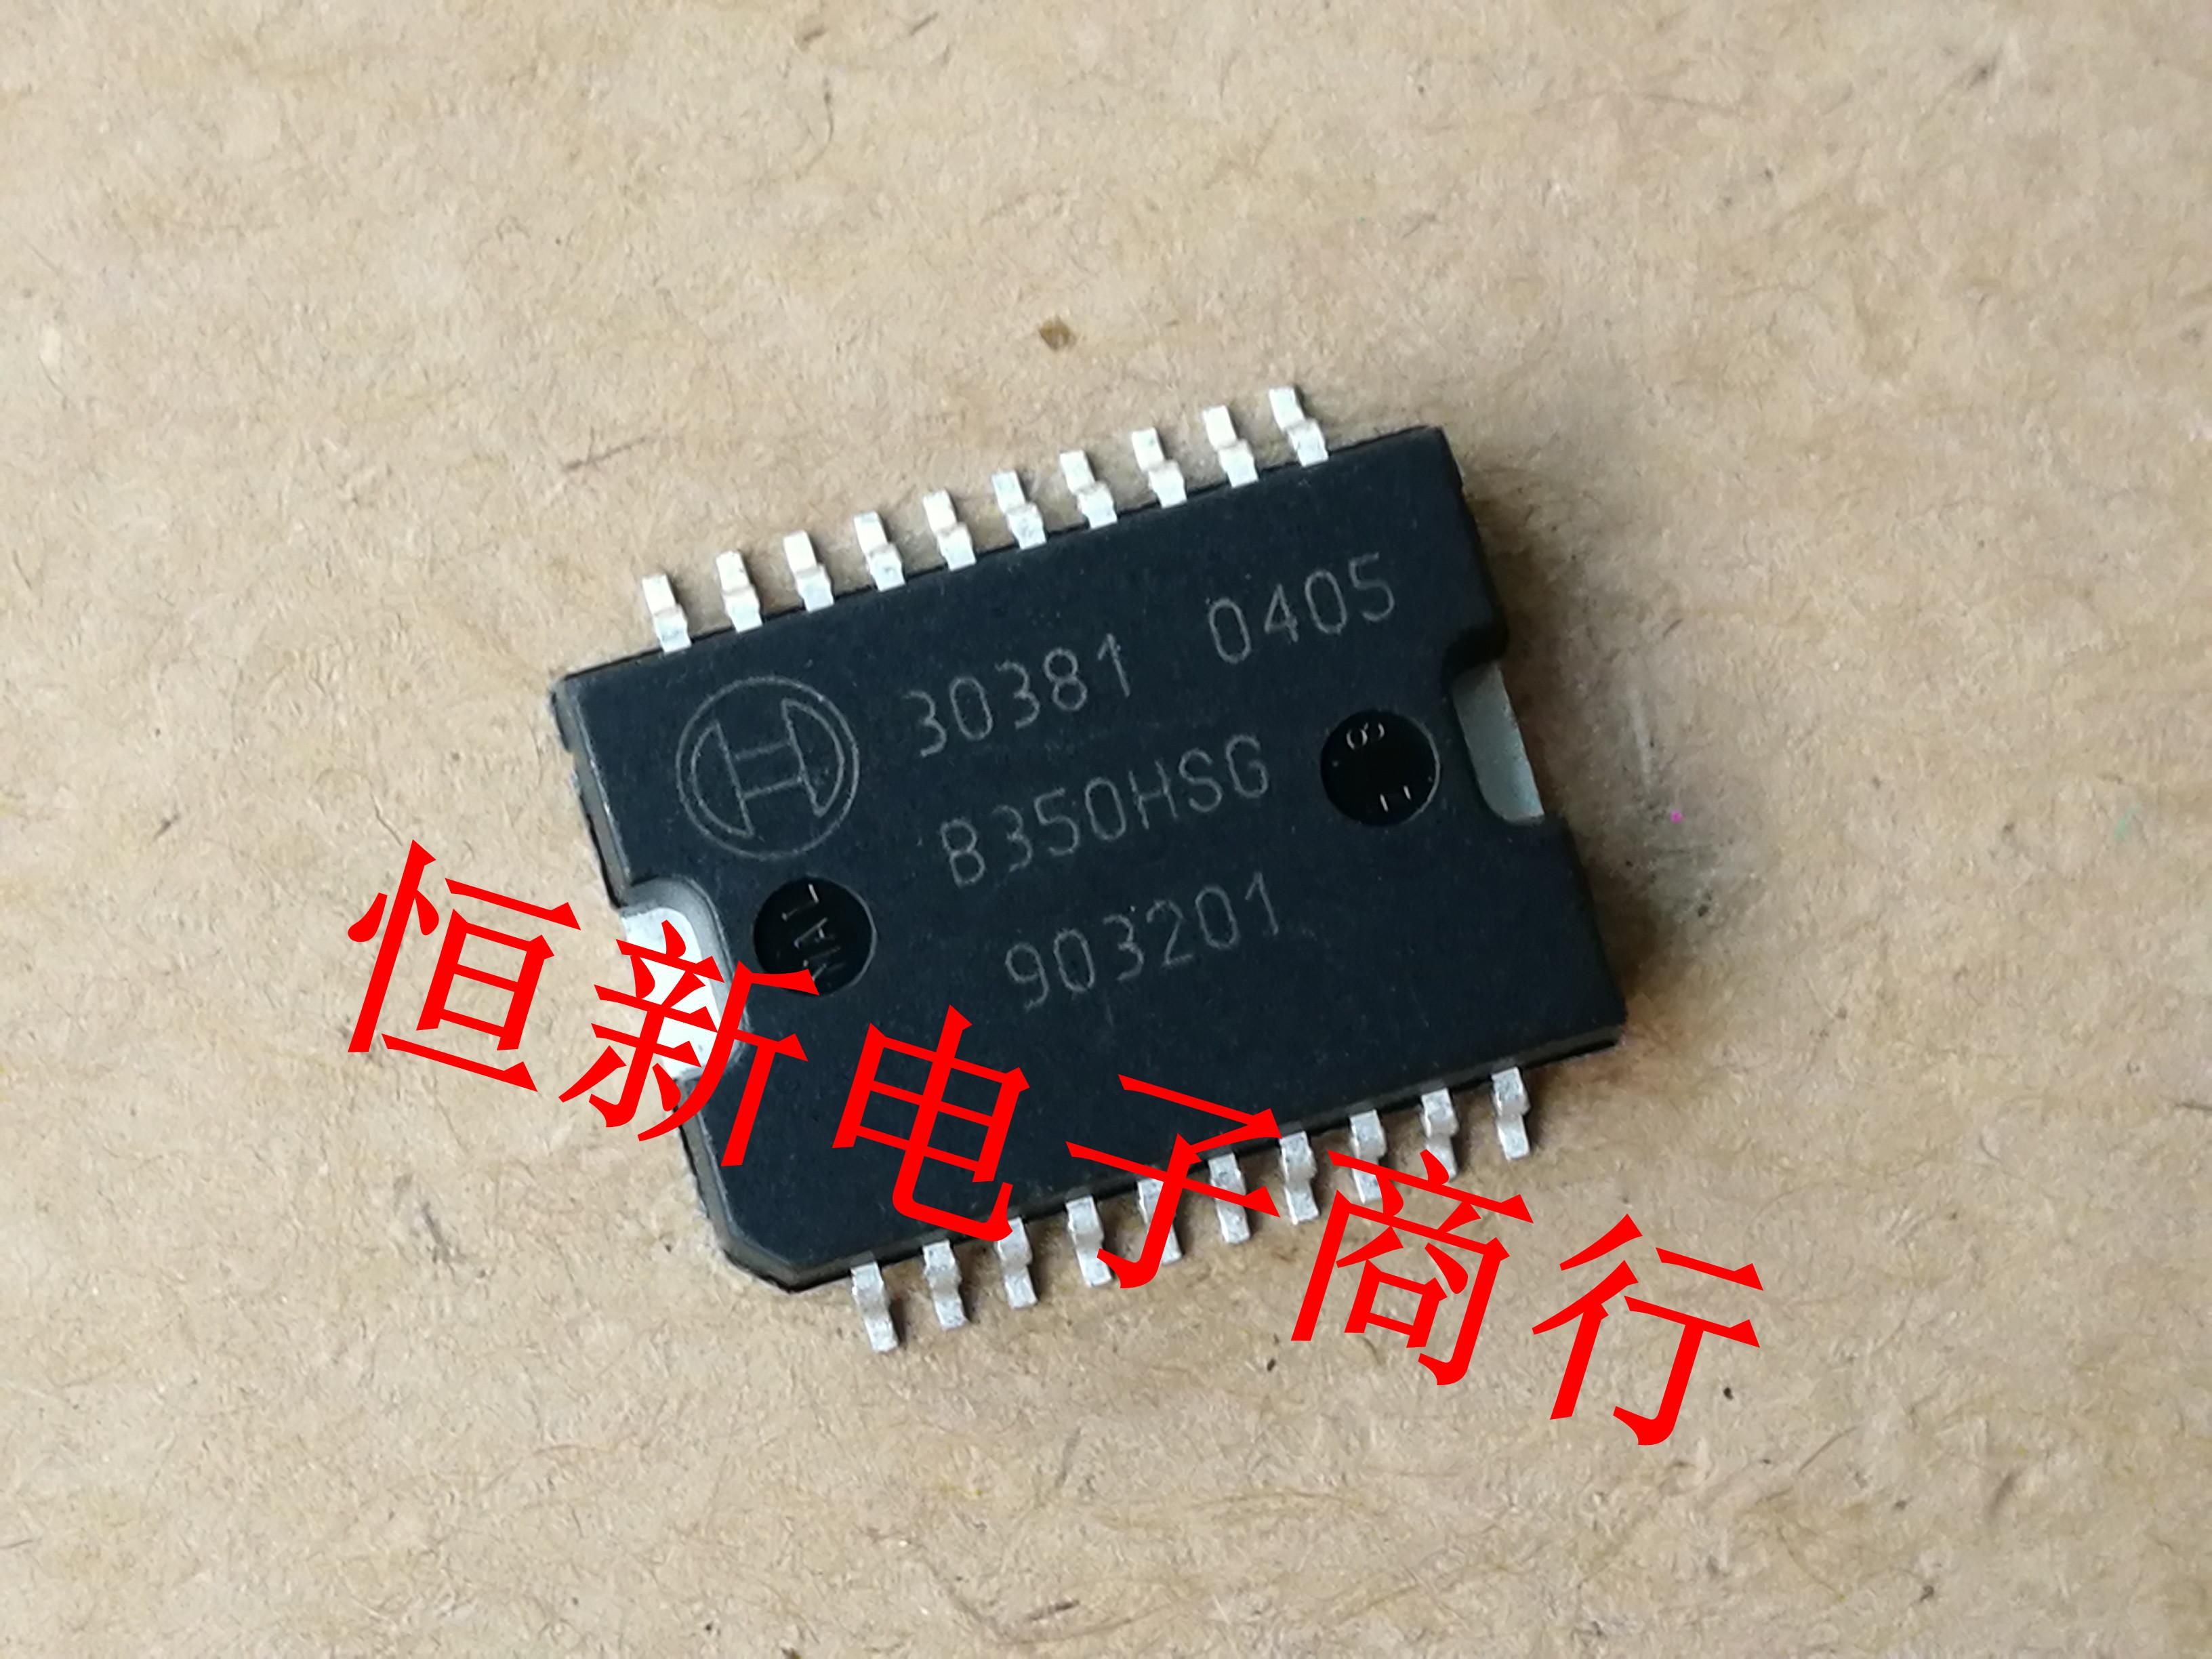 30381 ME7.5 M382汽车电脑板 全新捷达5V喷油驱动芯片 BOSCH ic